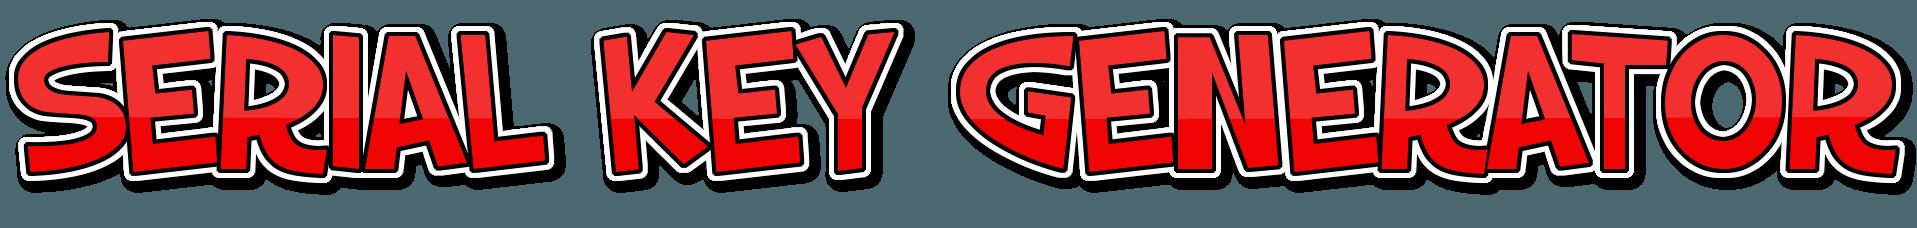 Serial Key Generator Free